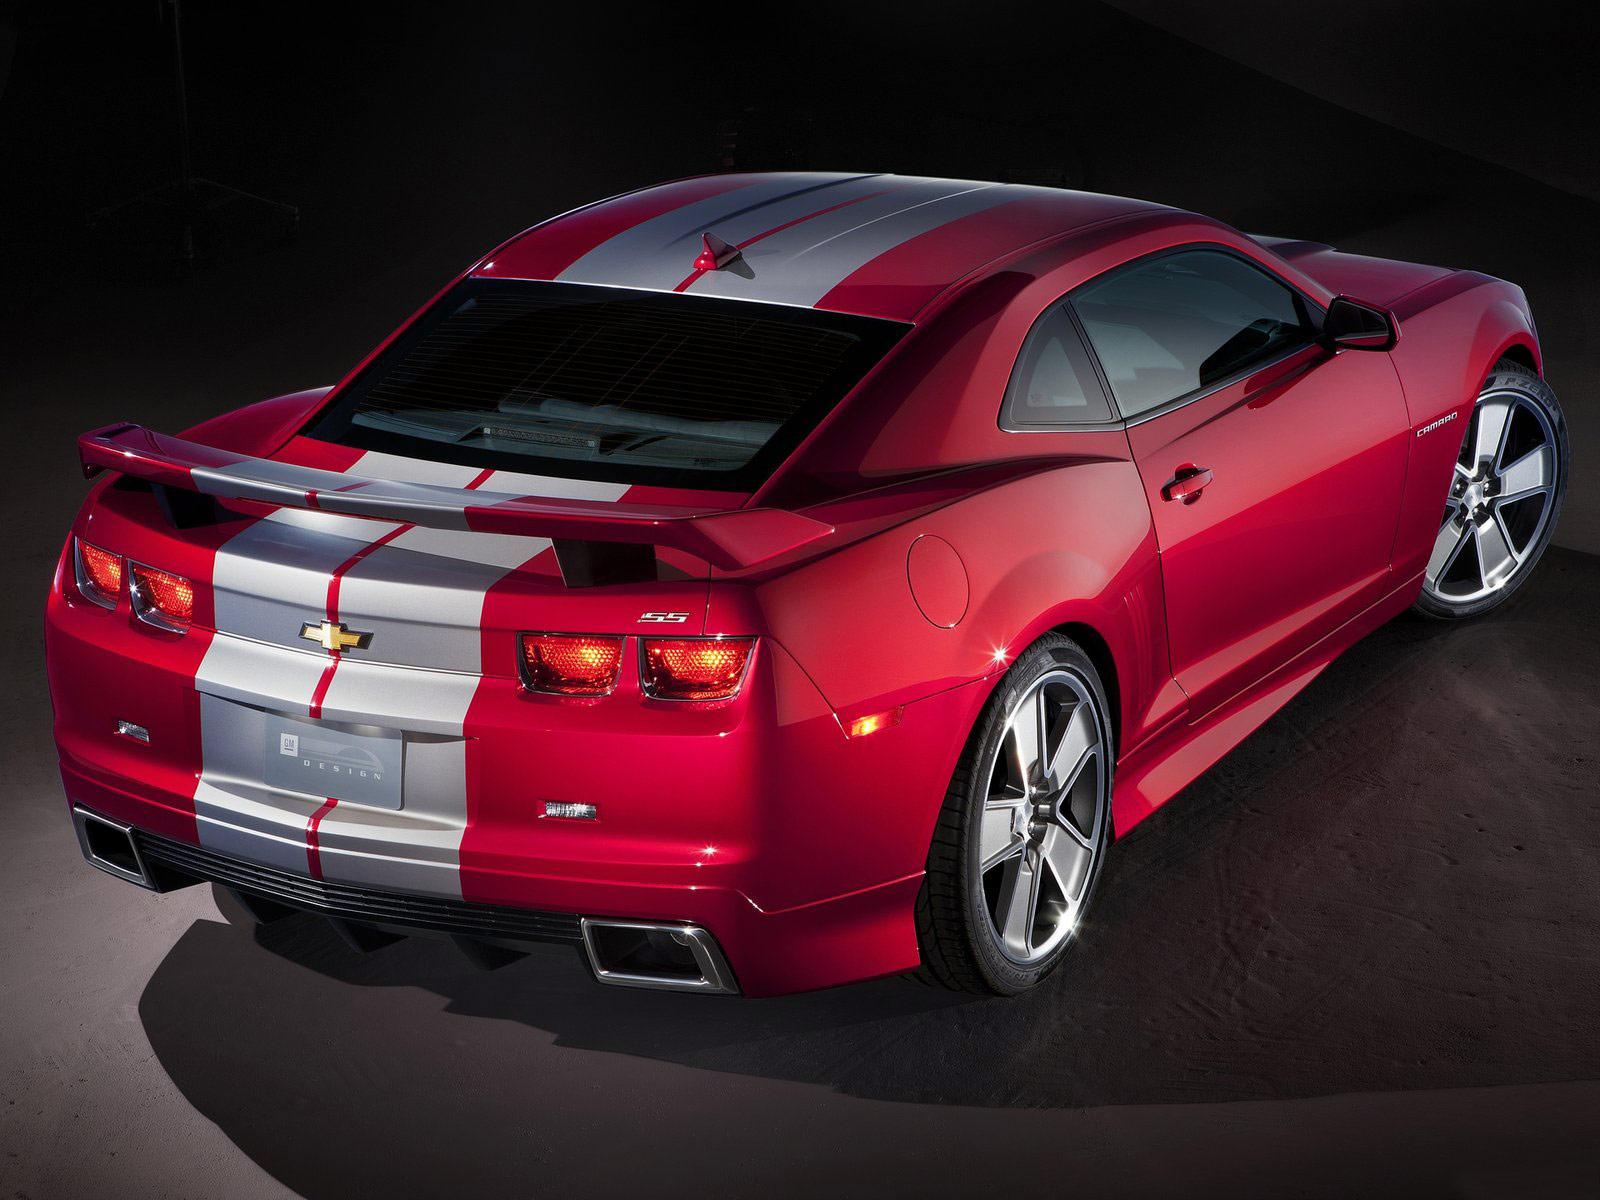 2010 Chevrolet Camaro Red Flash Concept Cars